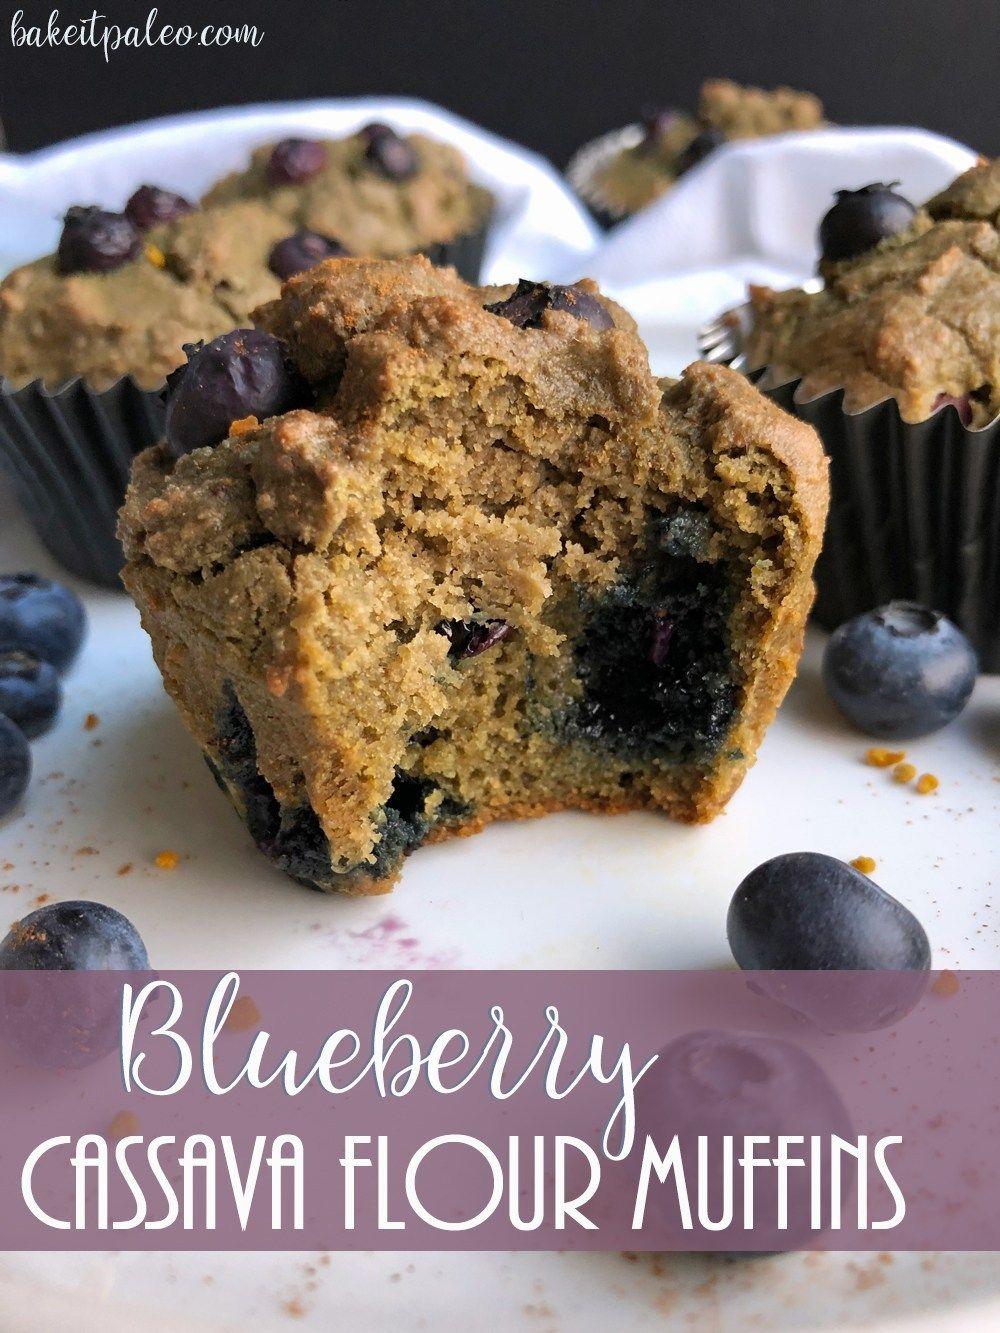 Blueberry Cassava Flour Muffins Recipe With Images Gluten